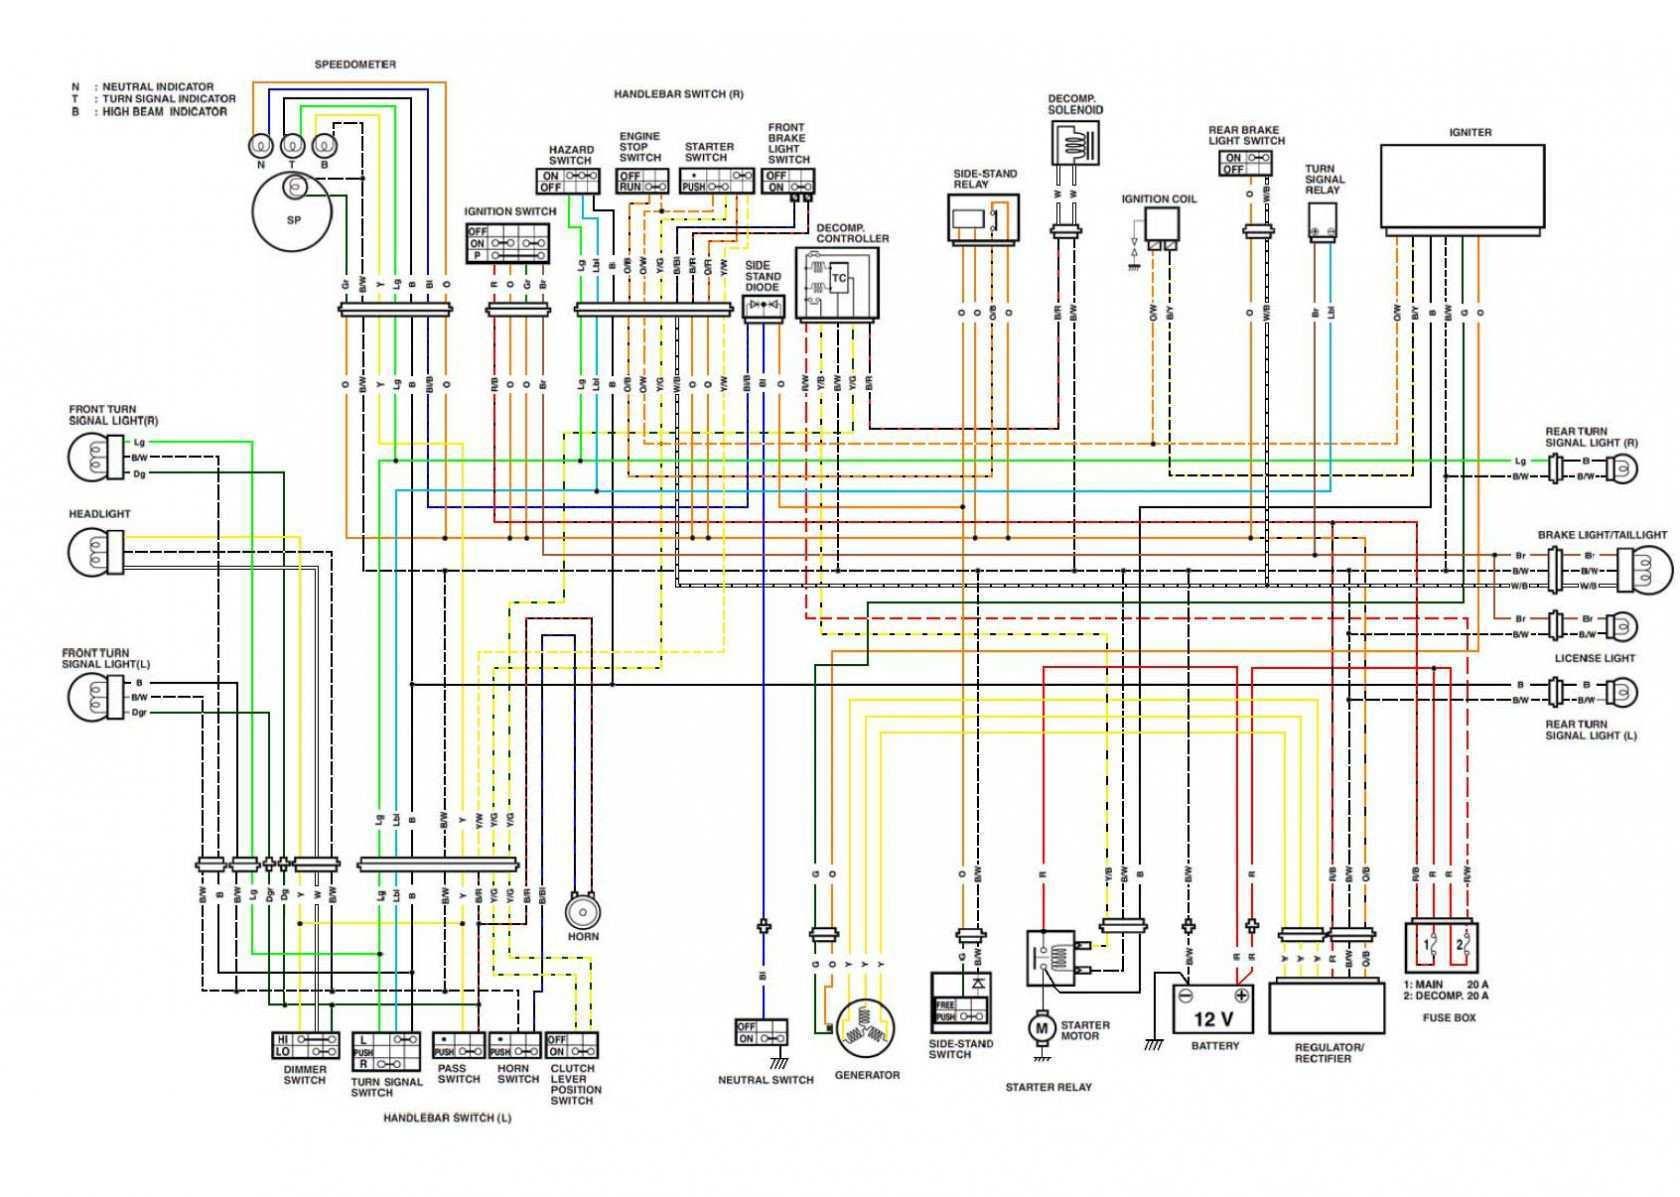 Automotive Wiring Diagrams Wiring Diagrams Online Wiring Diagram Shw